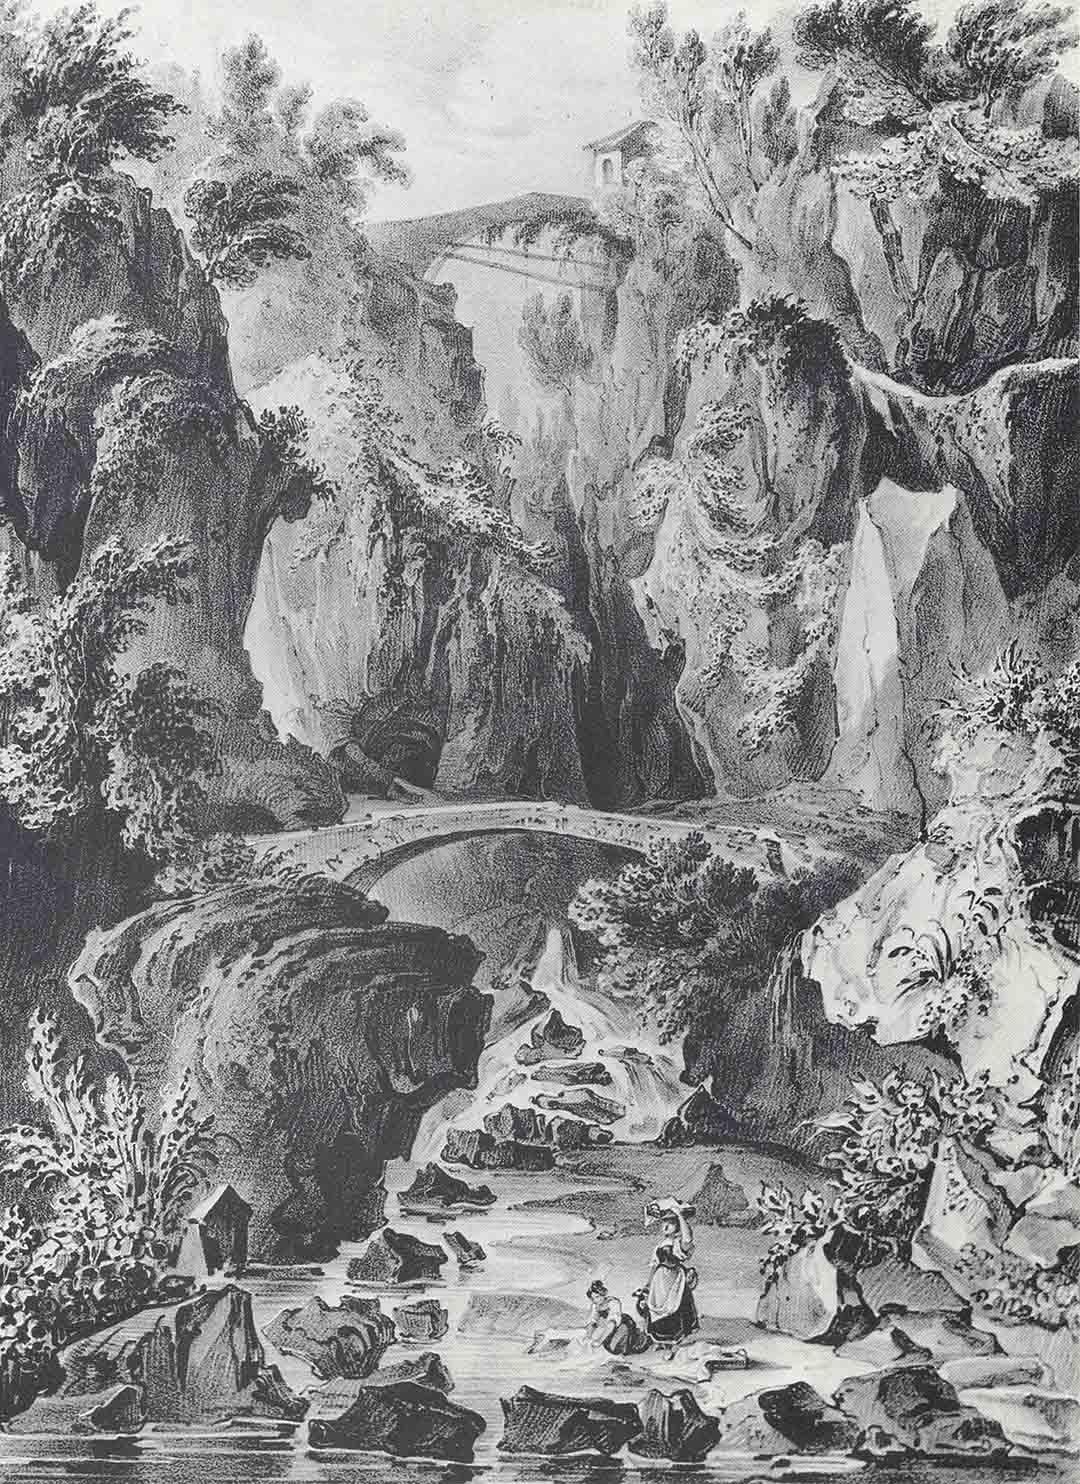 Johann WENZEL PETER (Karlsbad 1745 - Roma 1829) - Filippo CIRELLI (Campoli Appellino 1796 - 1867), Ponte dai Mulina at Sorrente